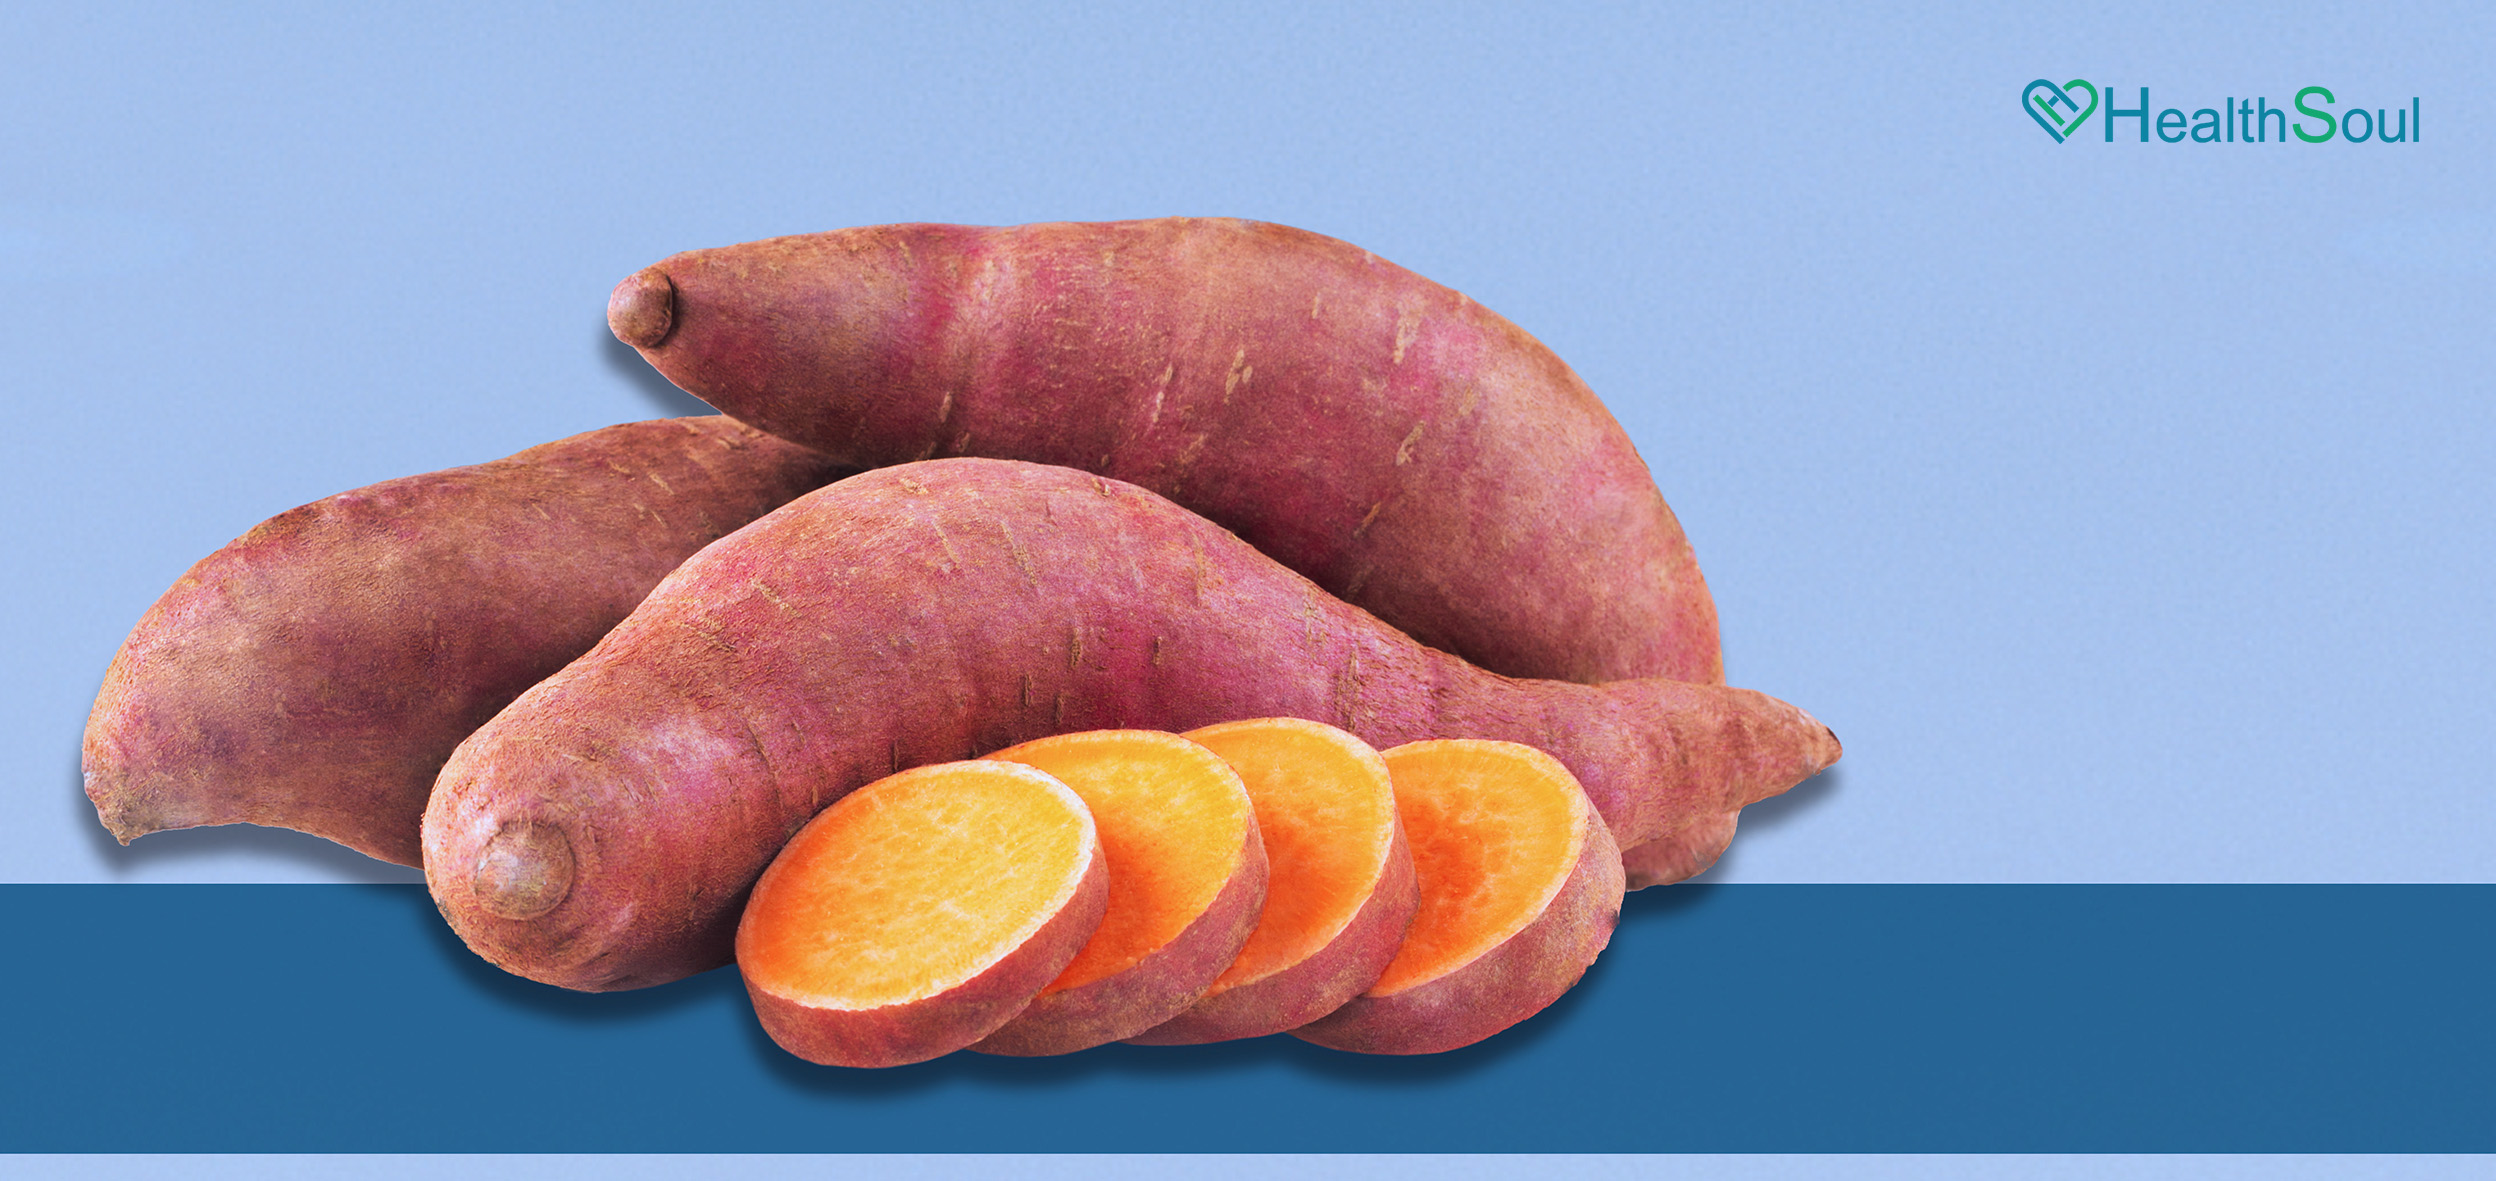 Health benefits of sweet potatoes | HealthSoul